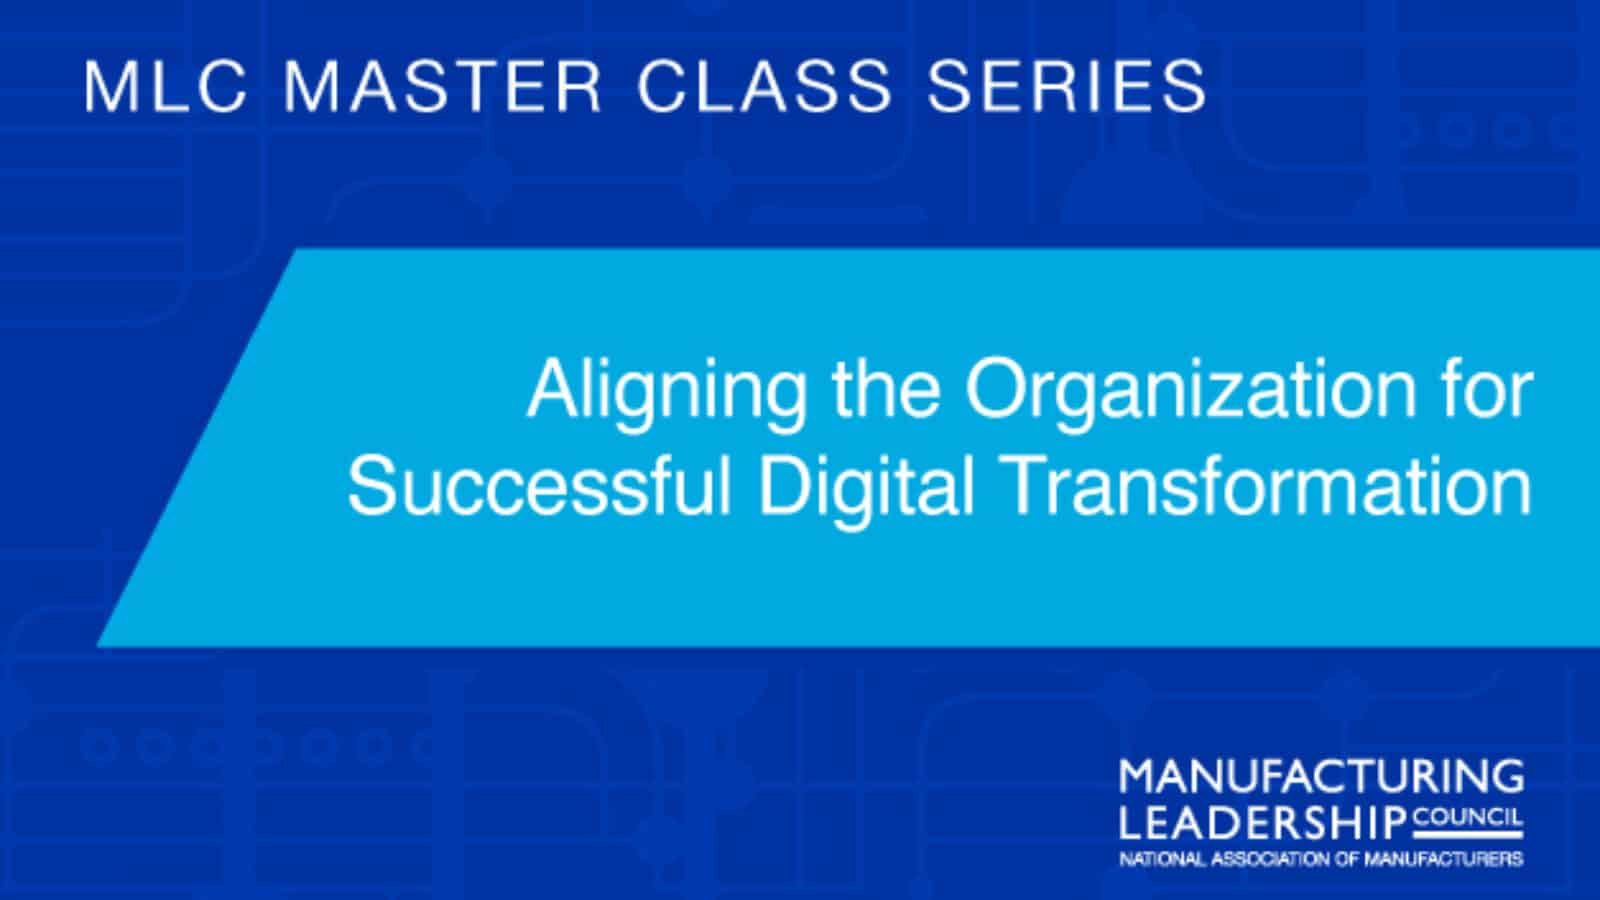 Aligning the Organization for Successful Digital Transformation